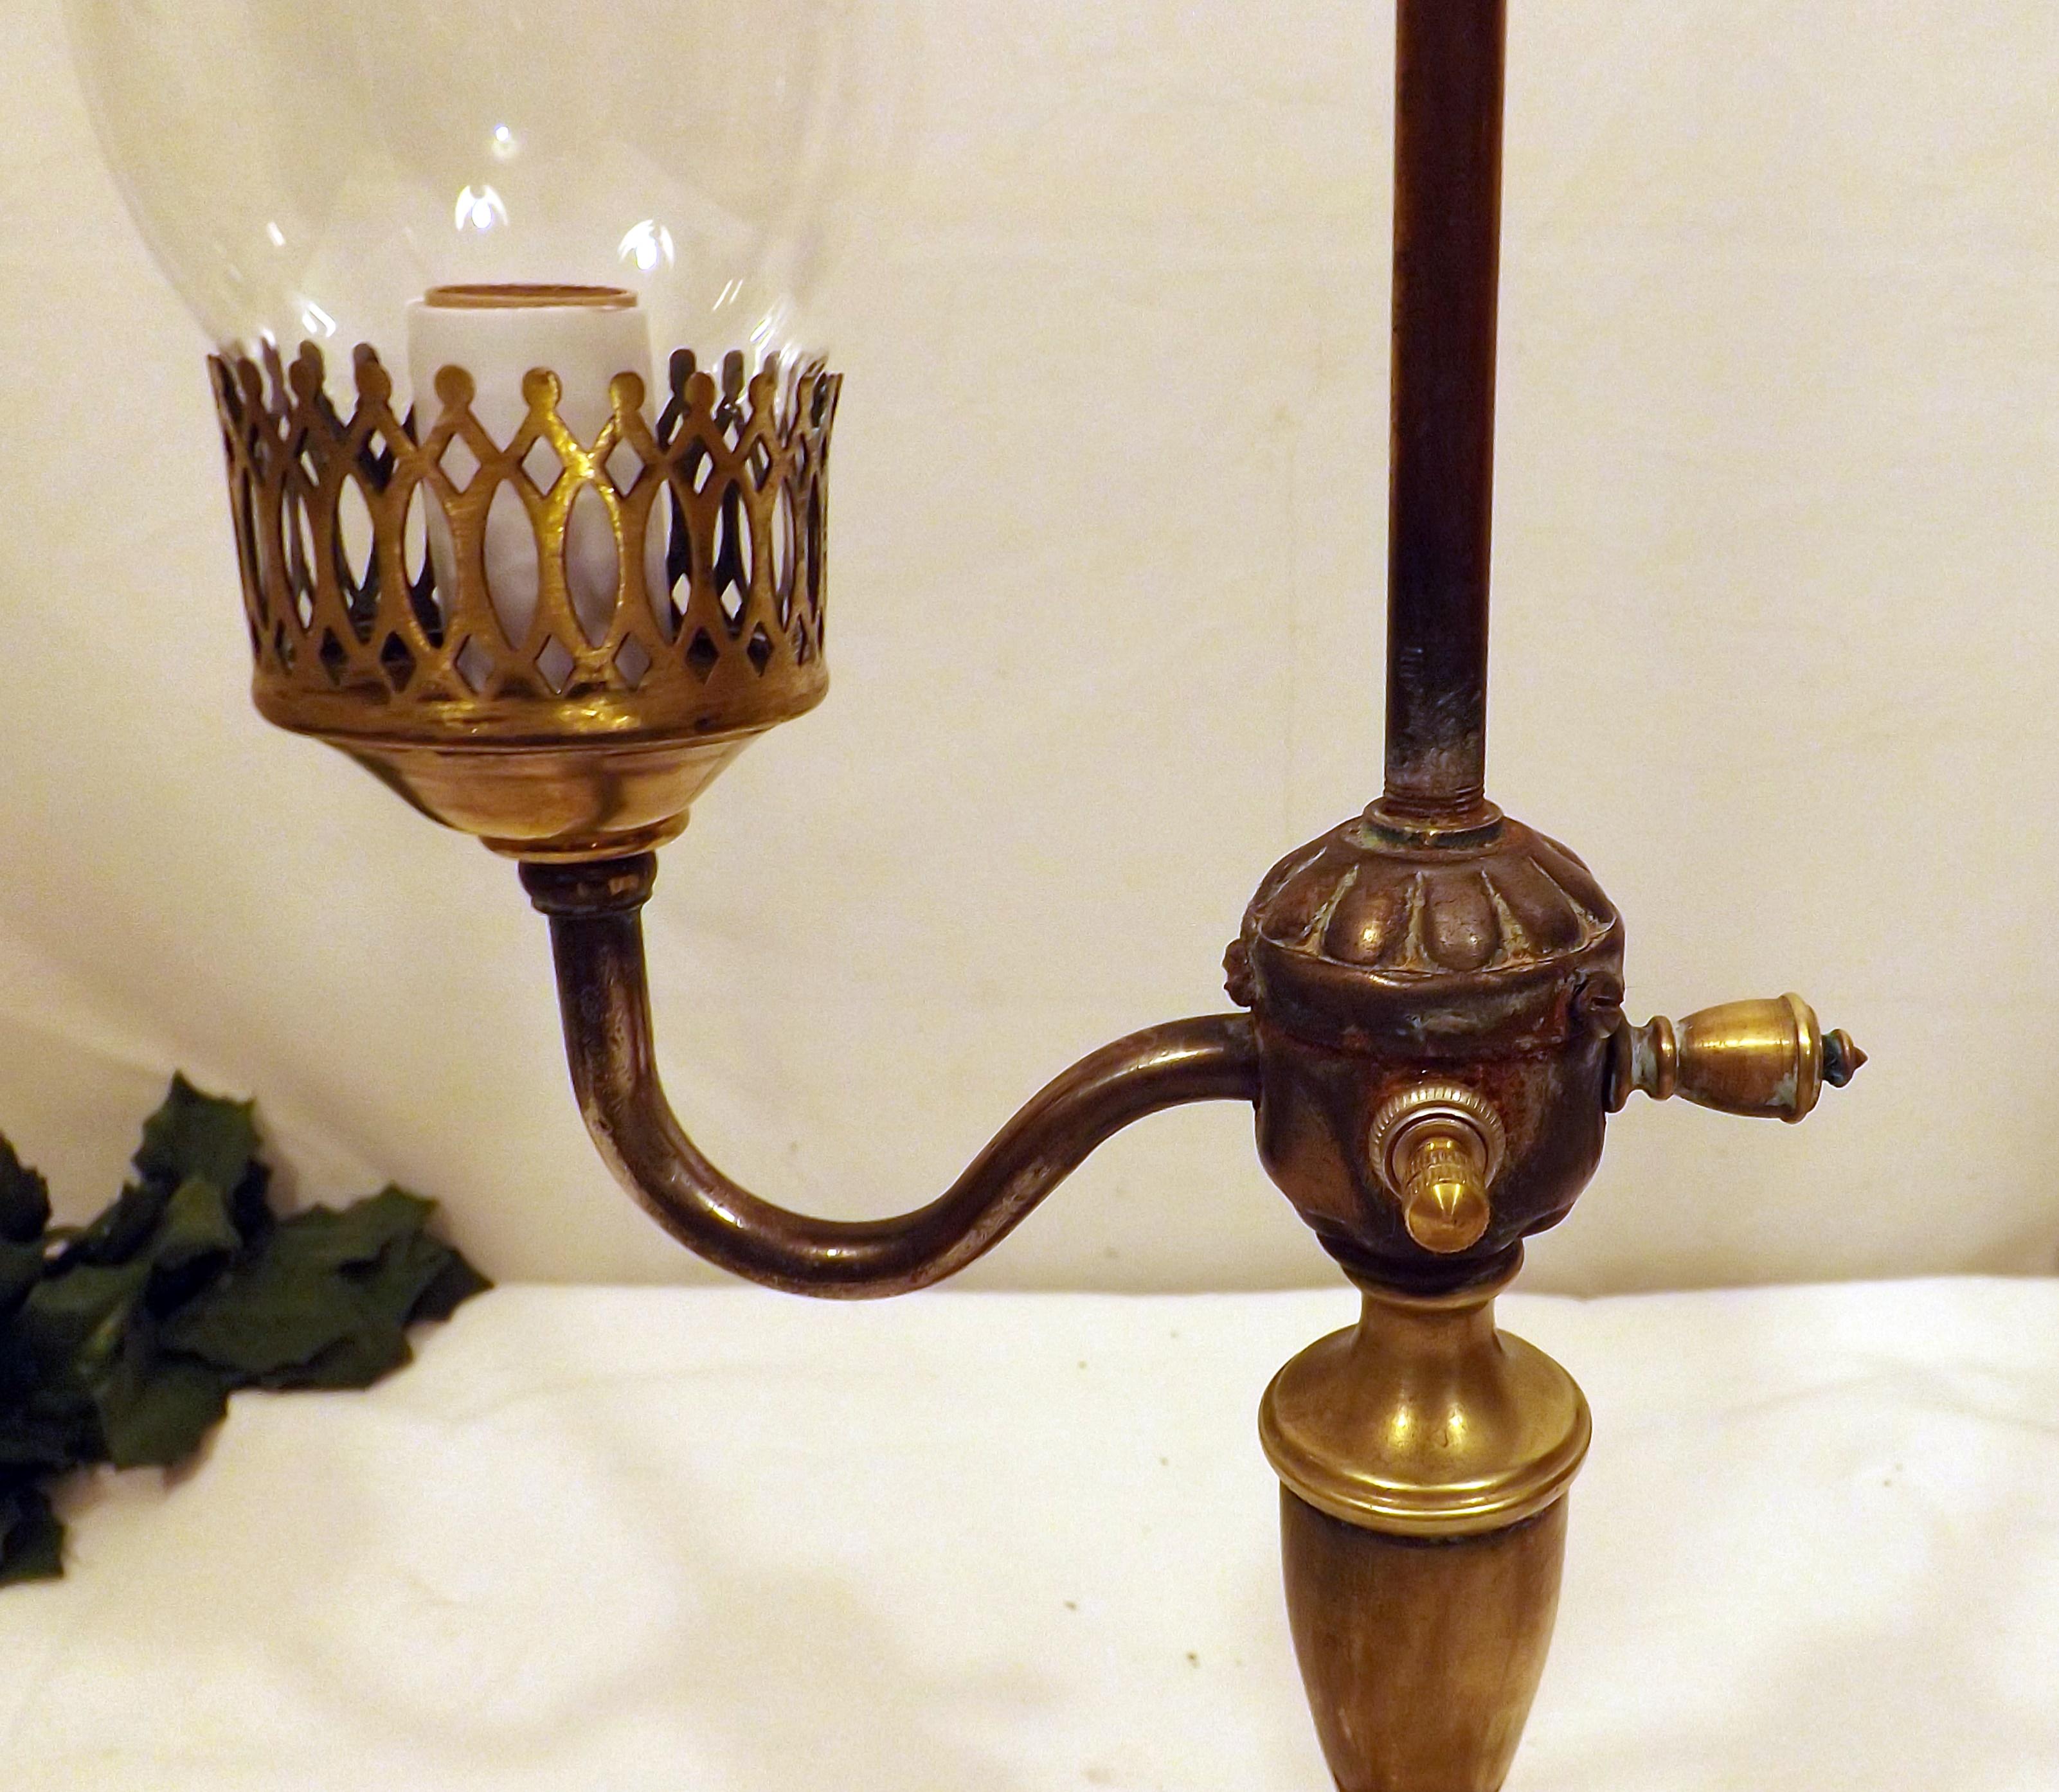 Wiring Light Fixture Socket Fixtures Hurricane Lamp Diagram Vintage Diy Enthusiasts Diagrams